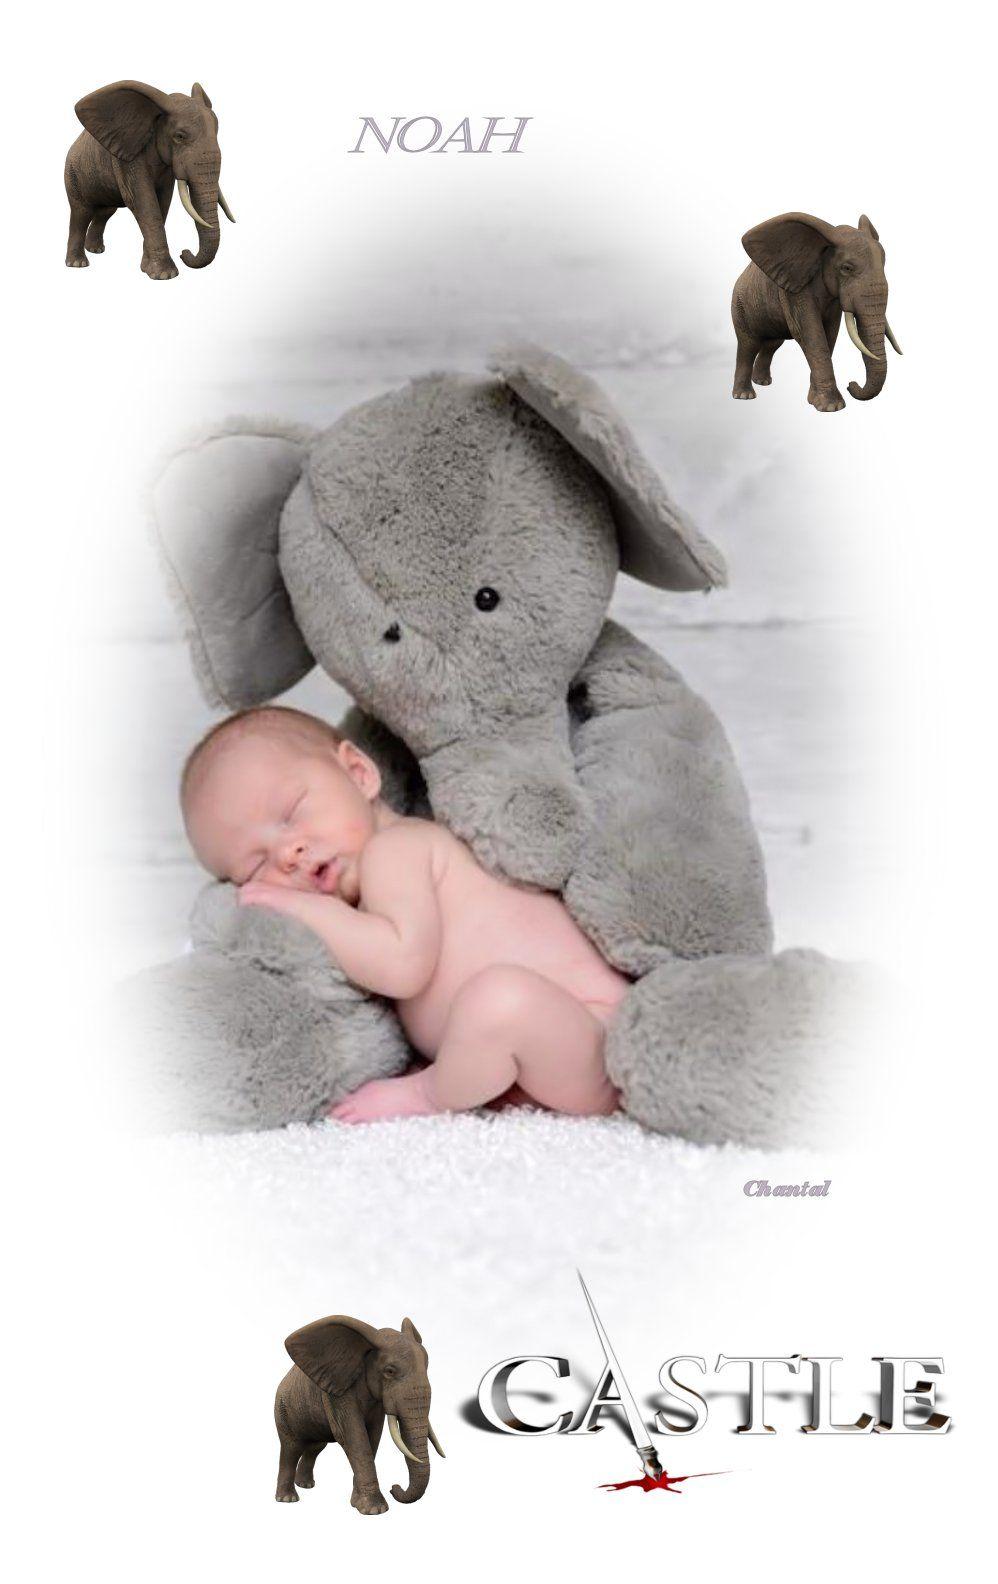 Castle Caskett Baby Elephant Baby Photo Baby